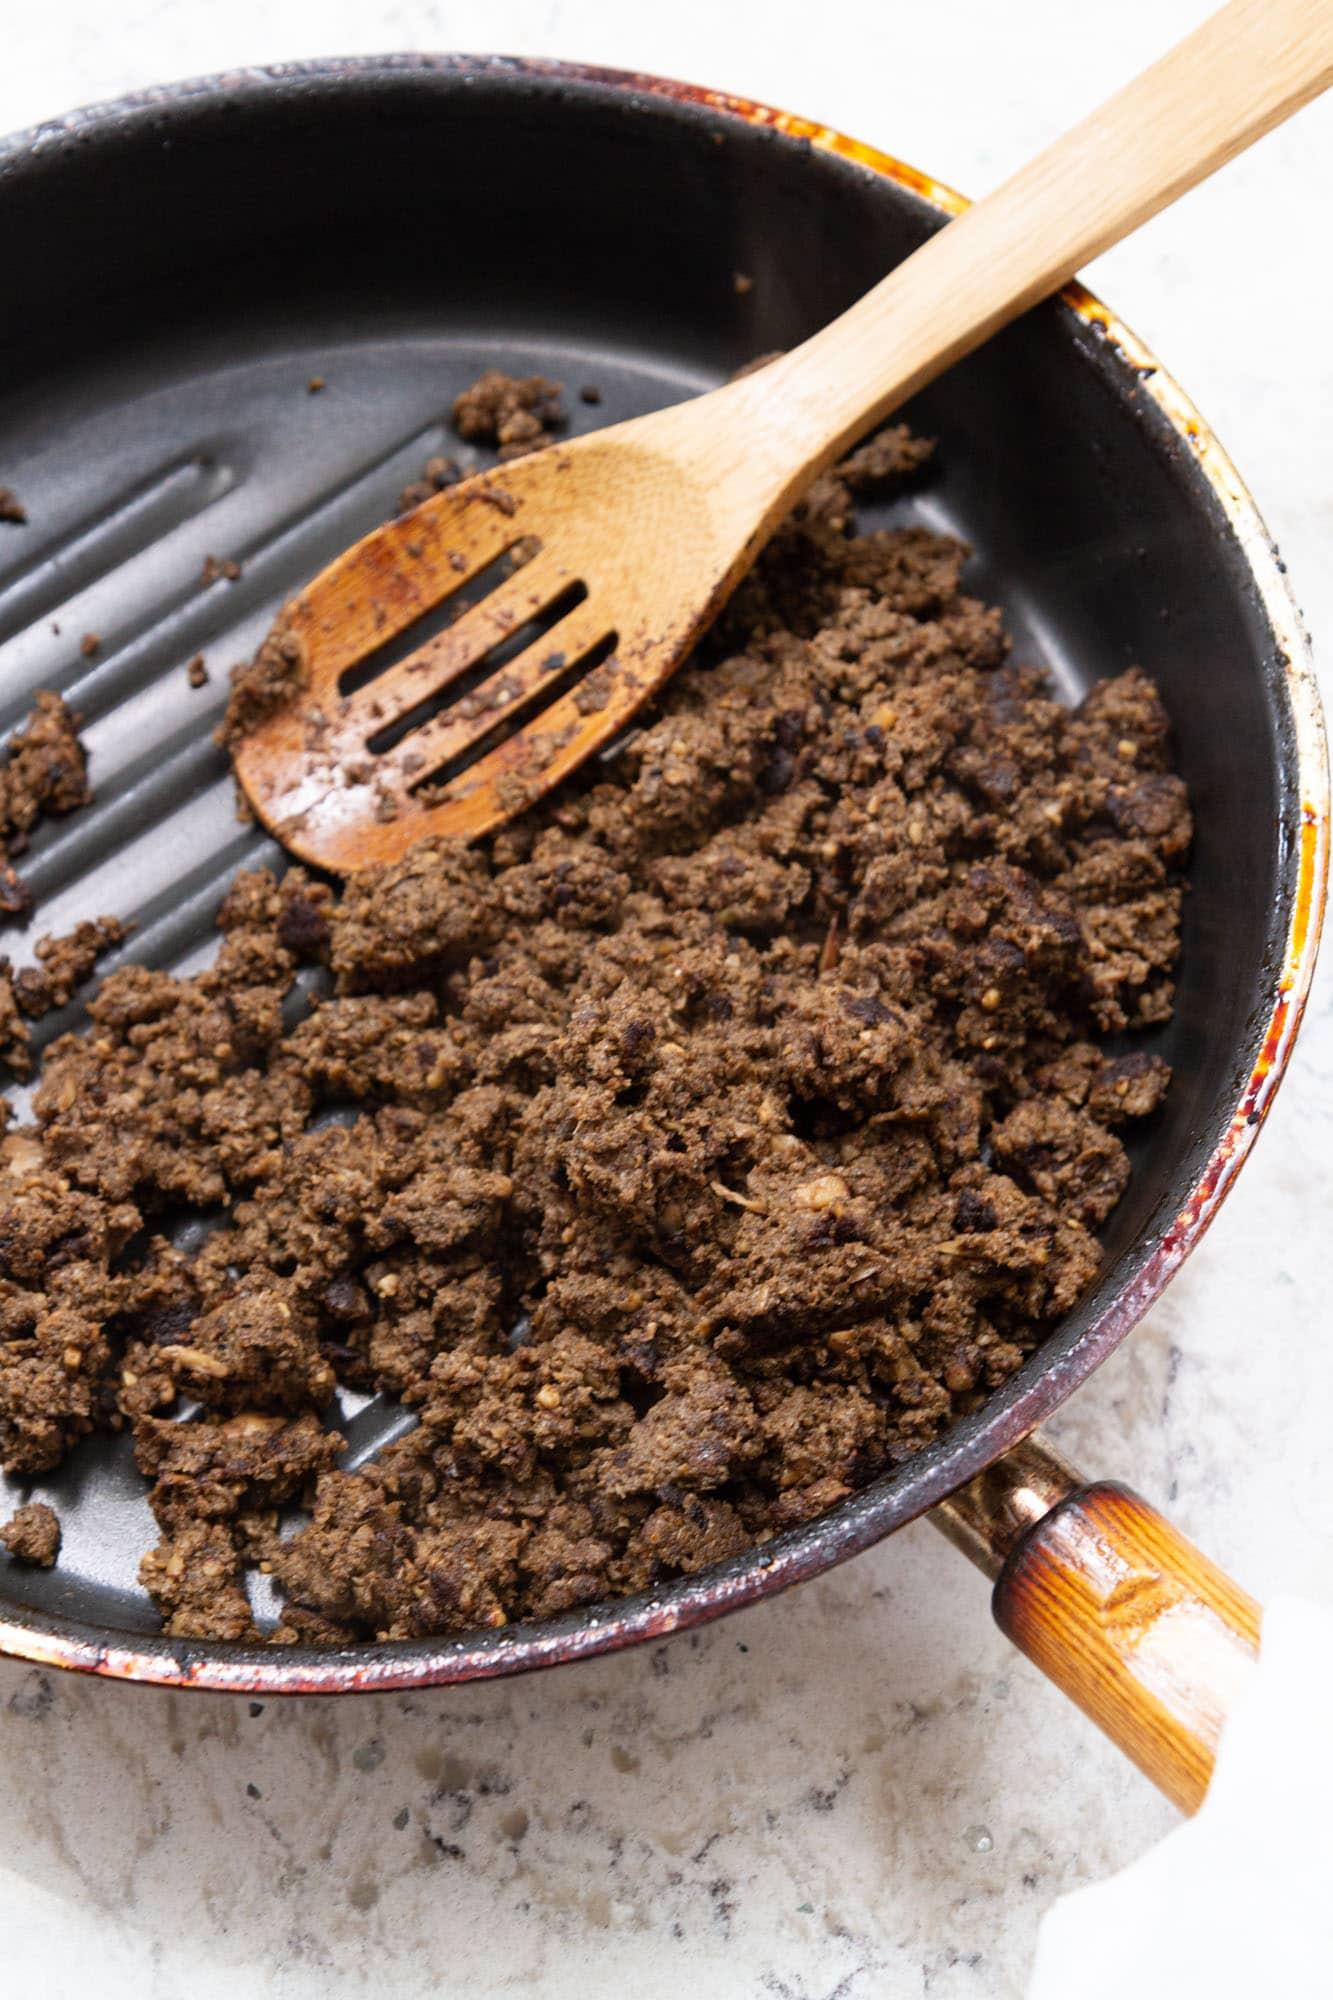 cooking mushrooms in pan